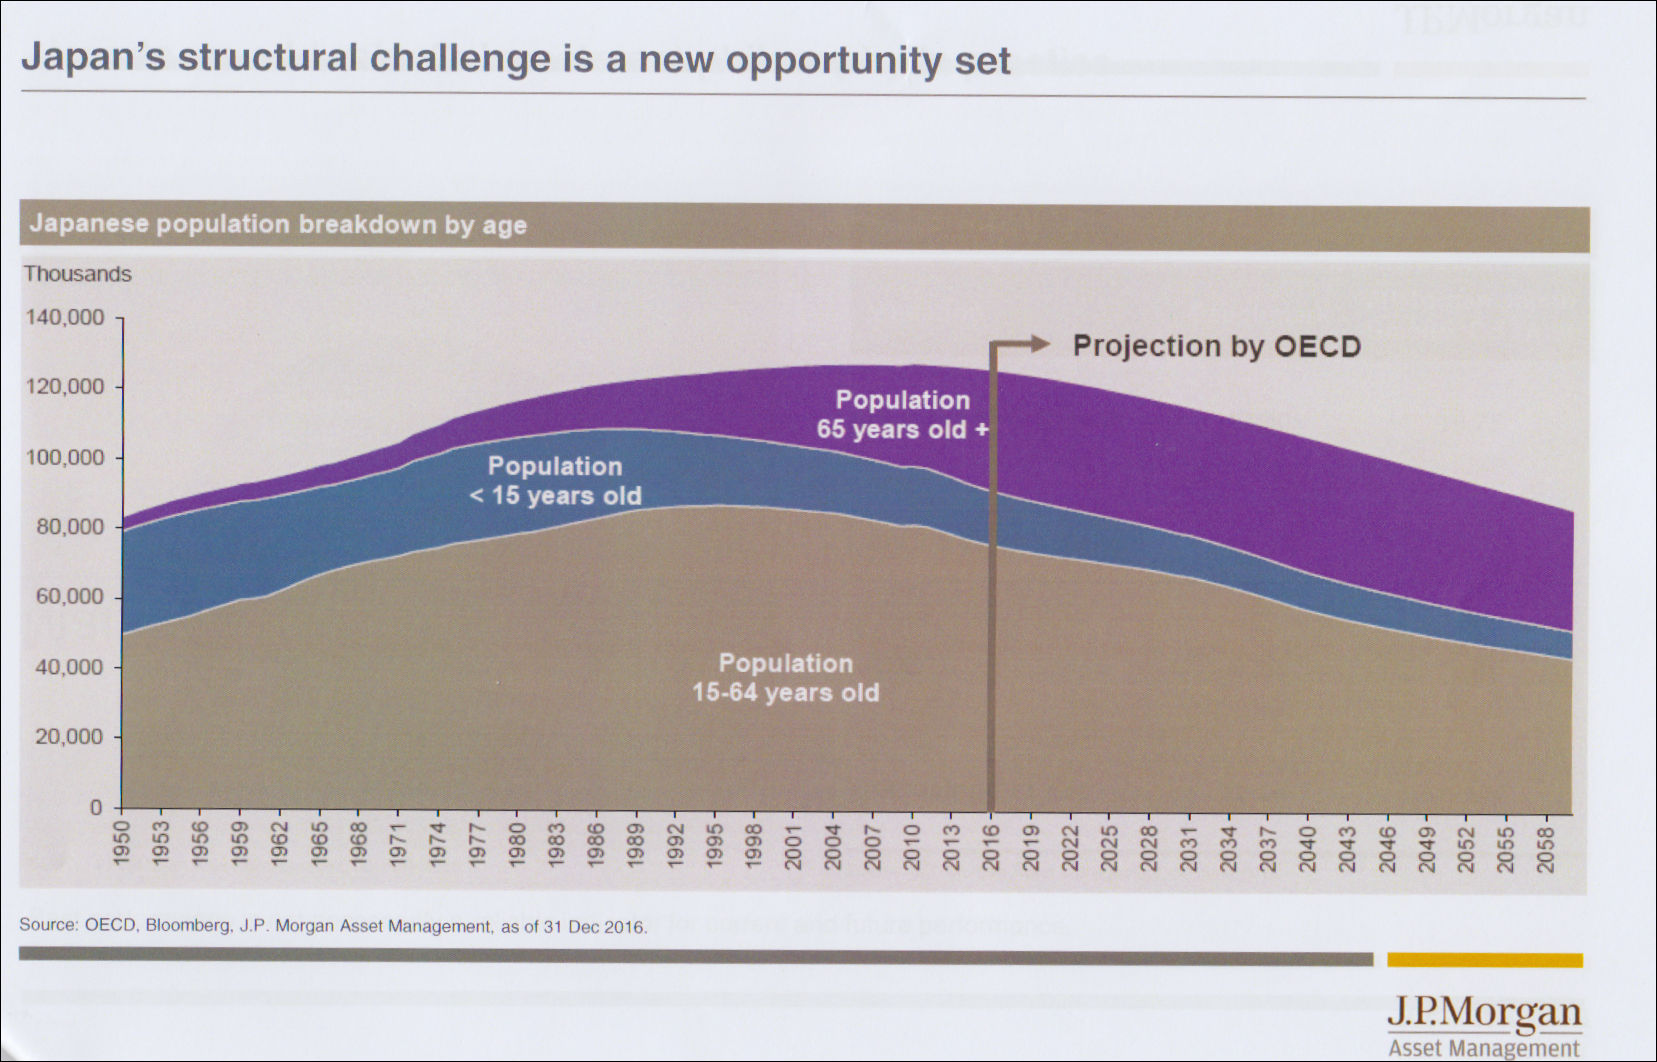 Japan's Structural Challenge